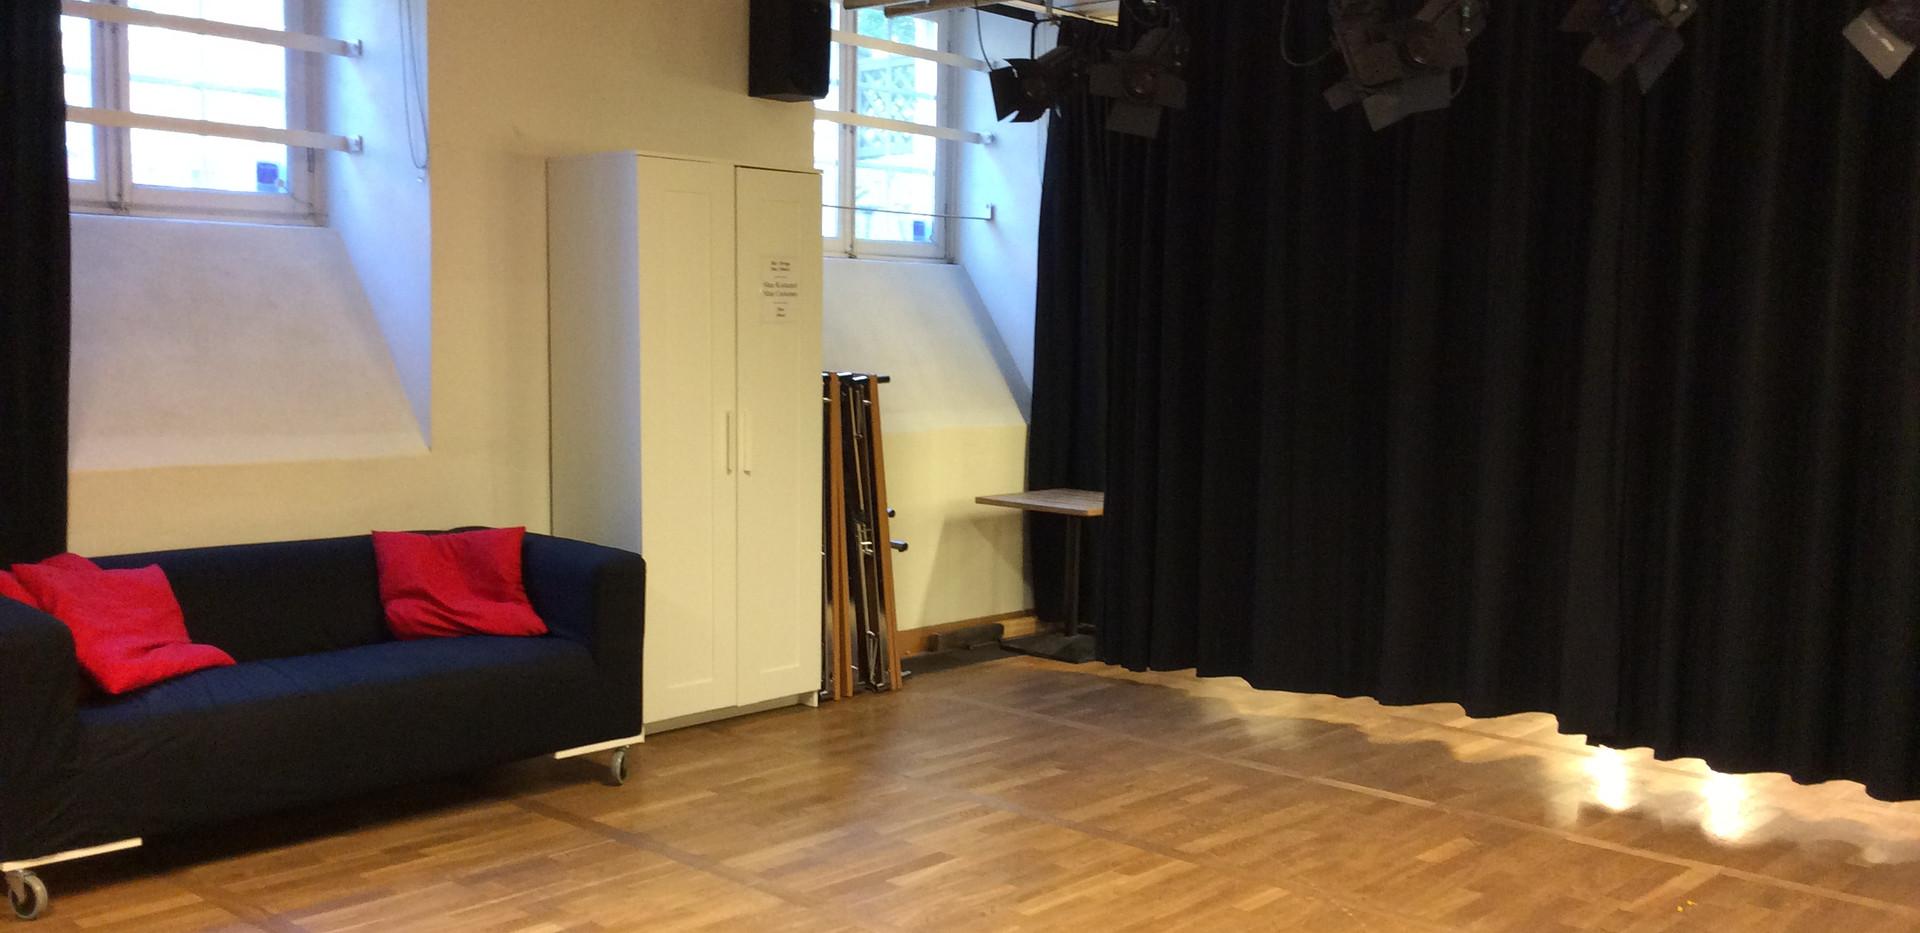 Folkuniversitetet - Stockholm